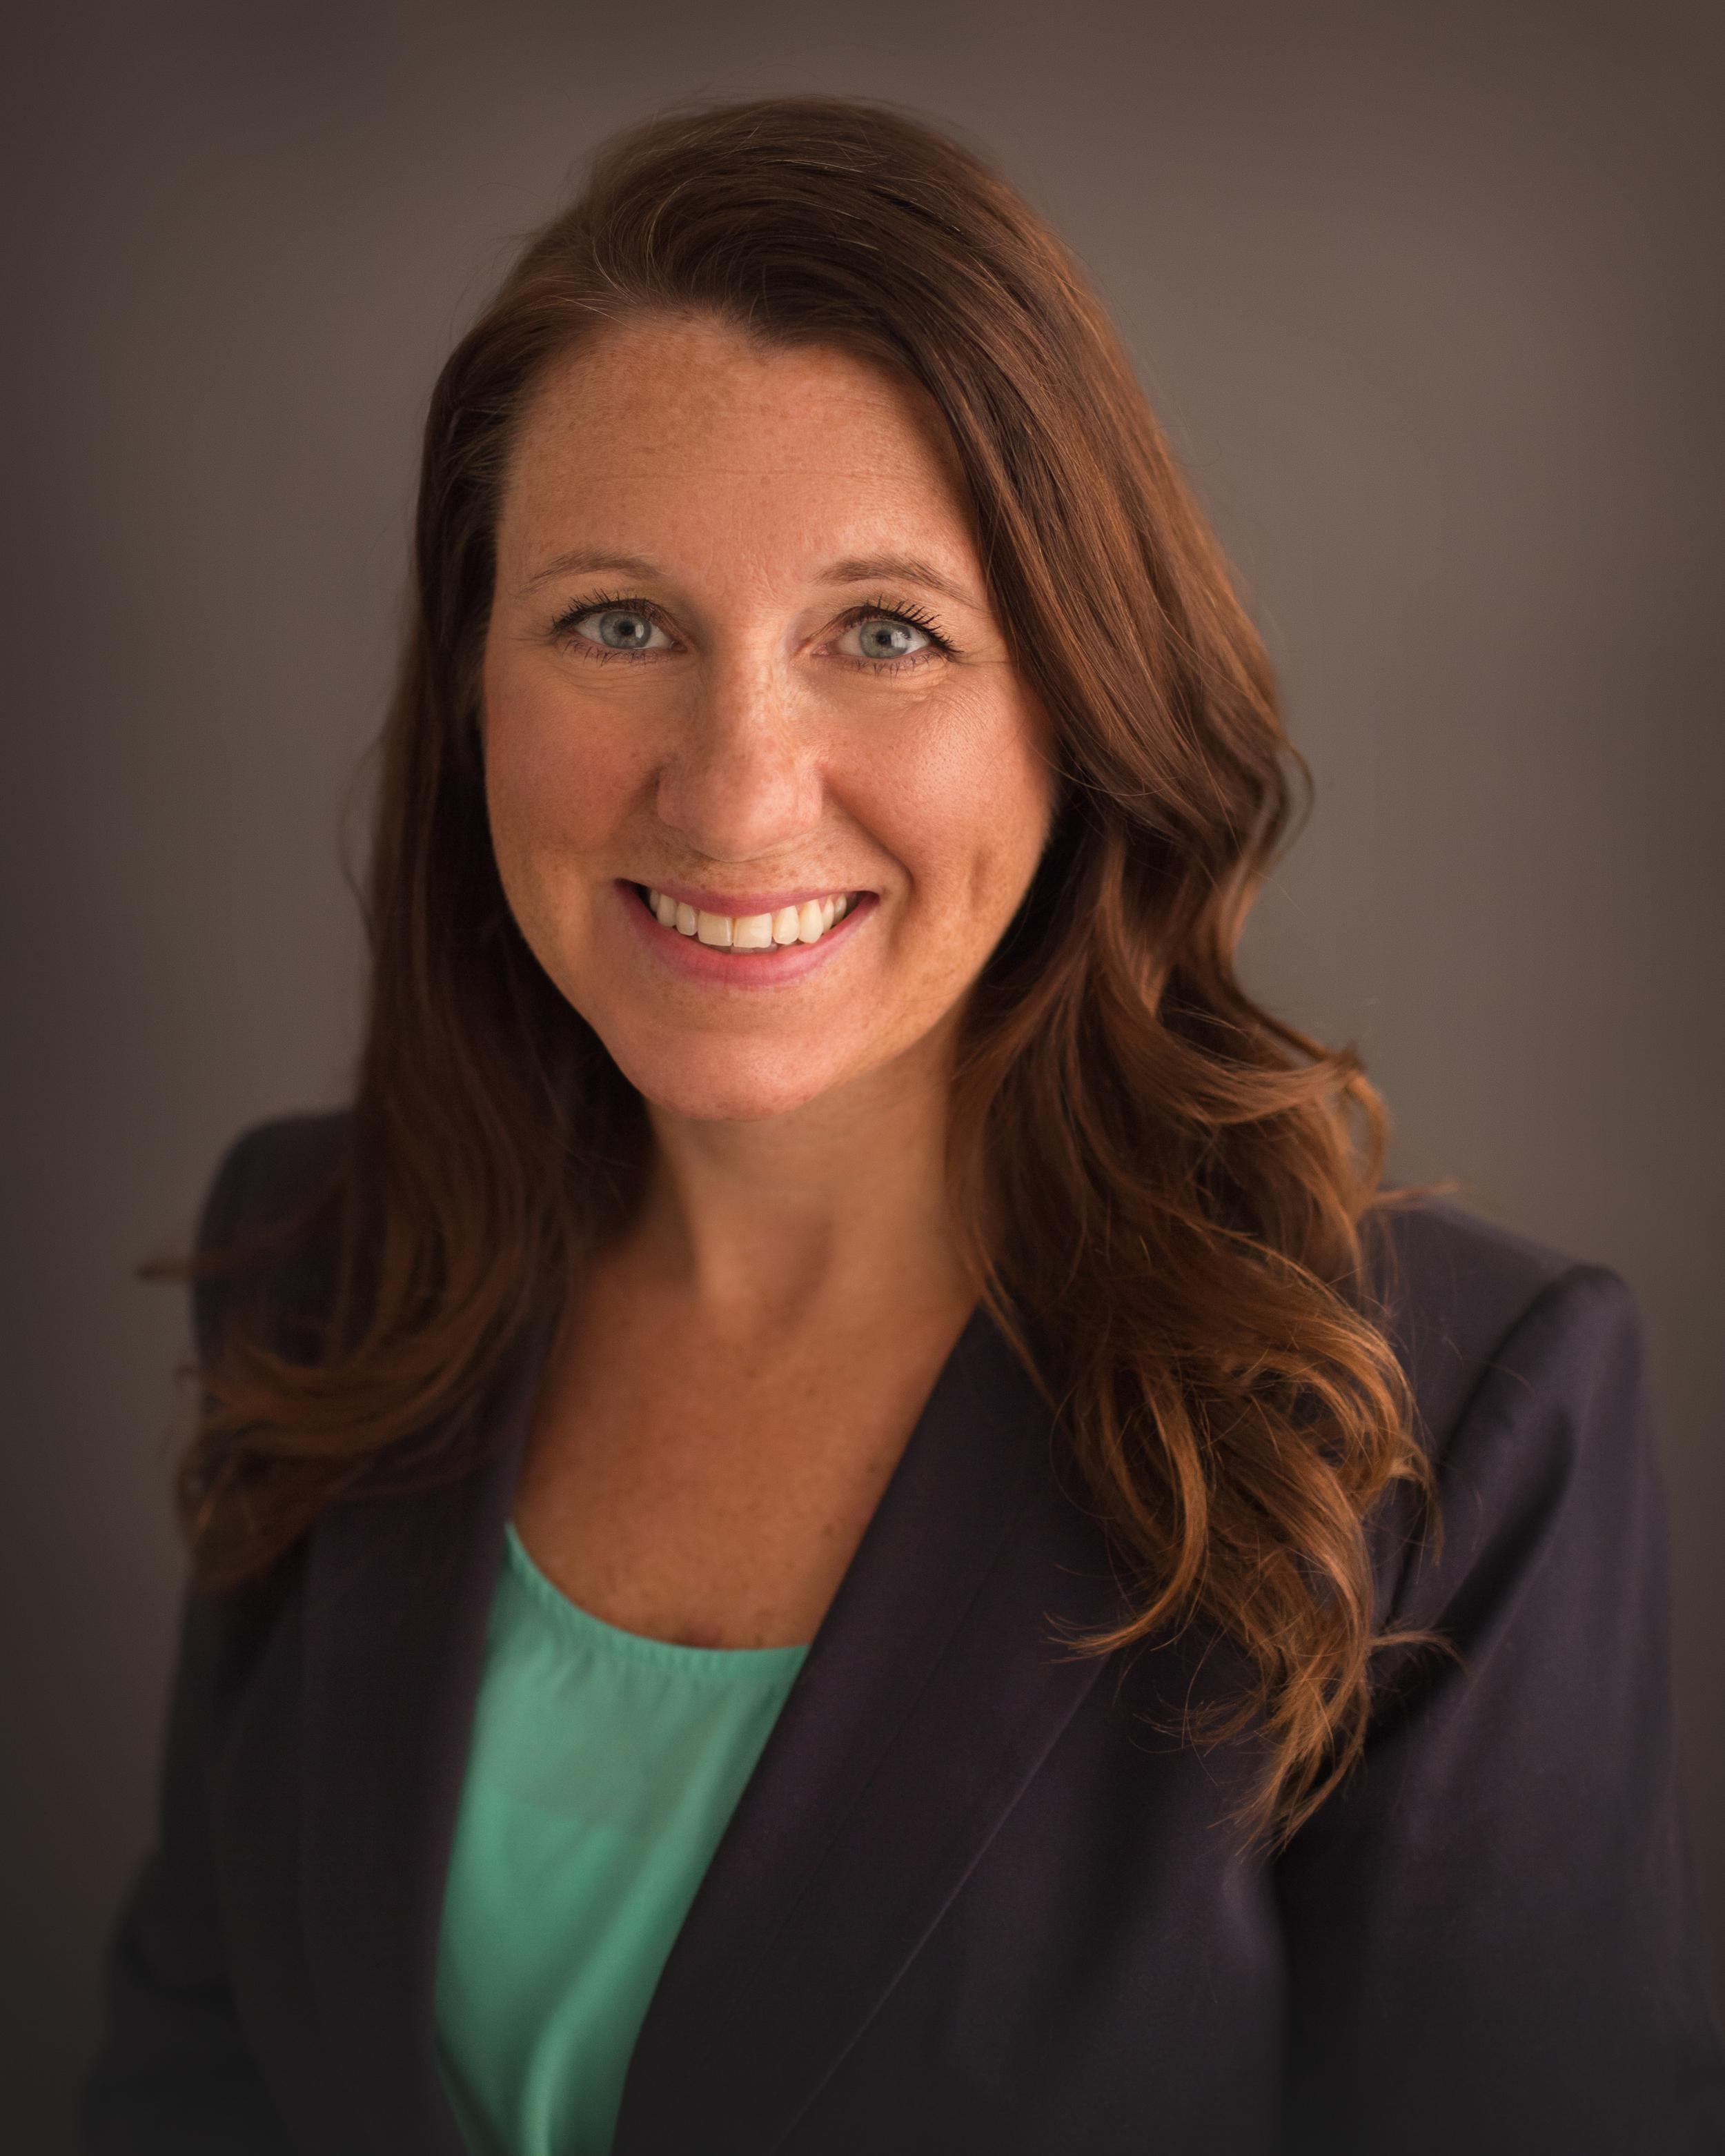 "<a href=""mailto:lgilbertson@summit-re.com"">Lisa Gilbertson</a>"